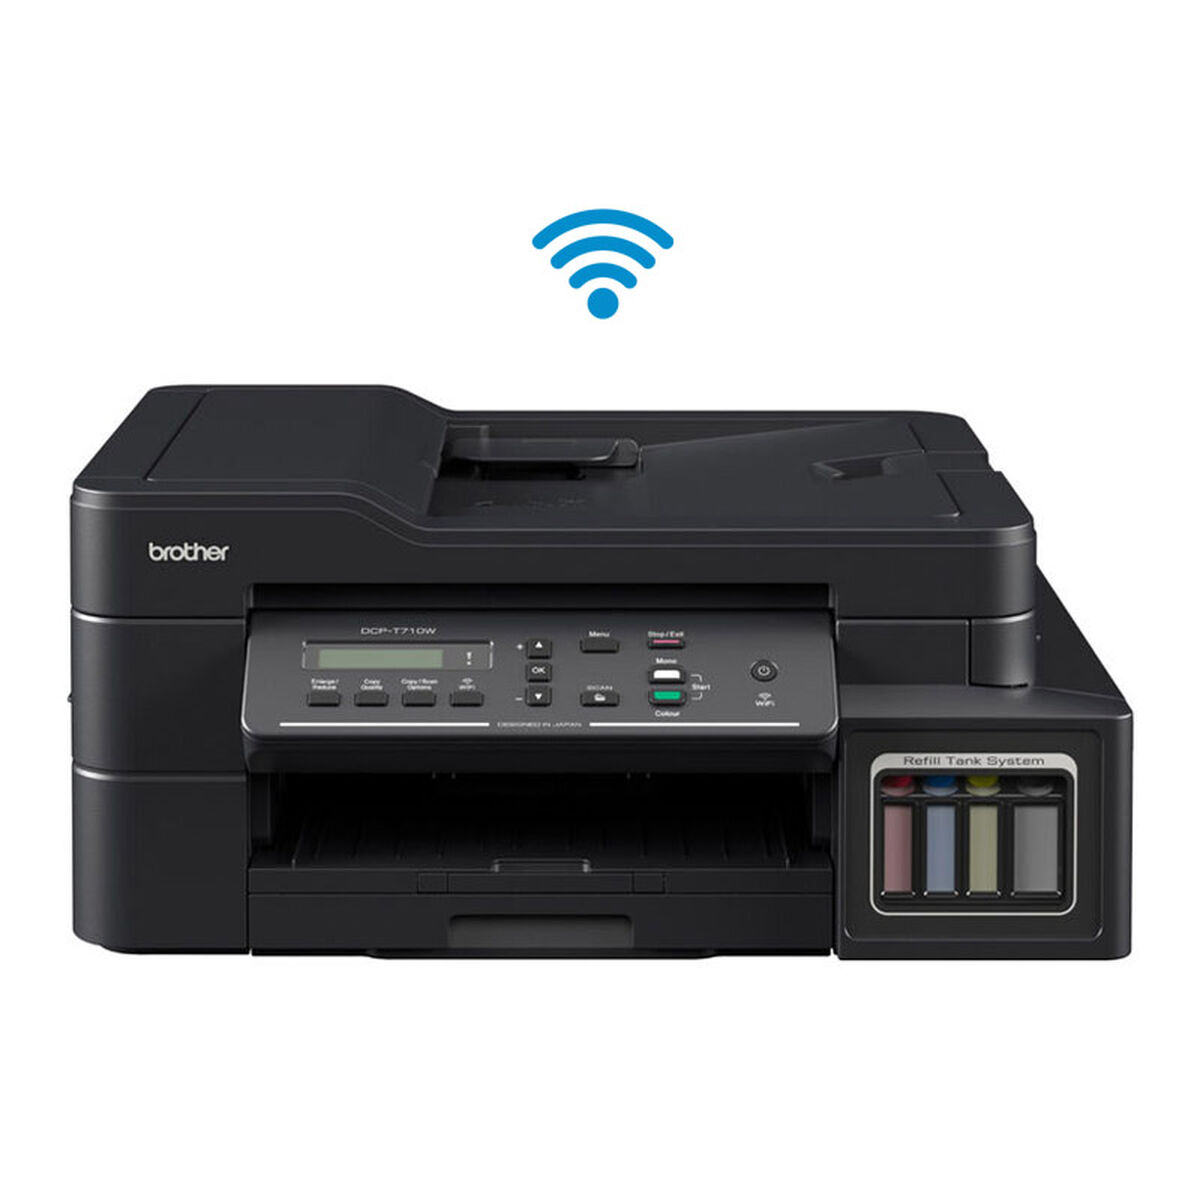 Multifuncional Brother Tinta Continua DCP-710 WiFi